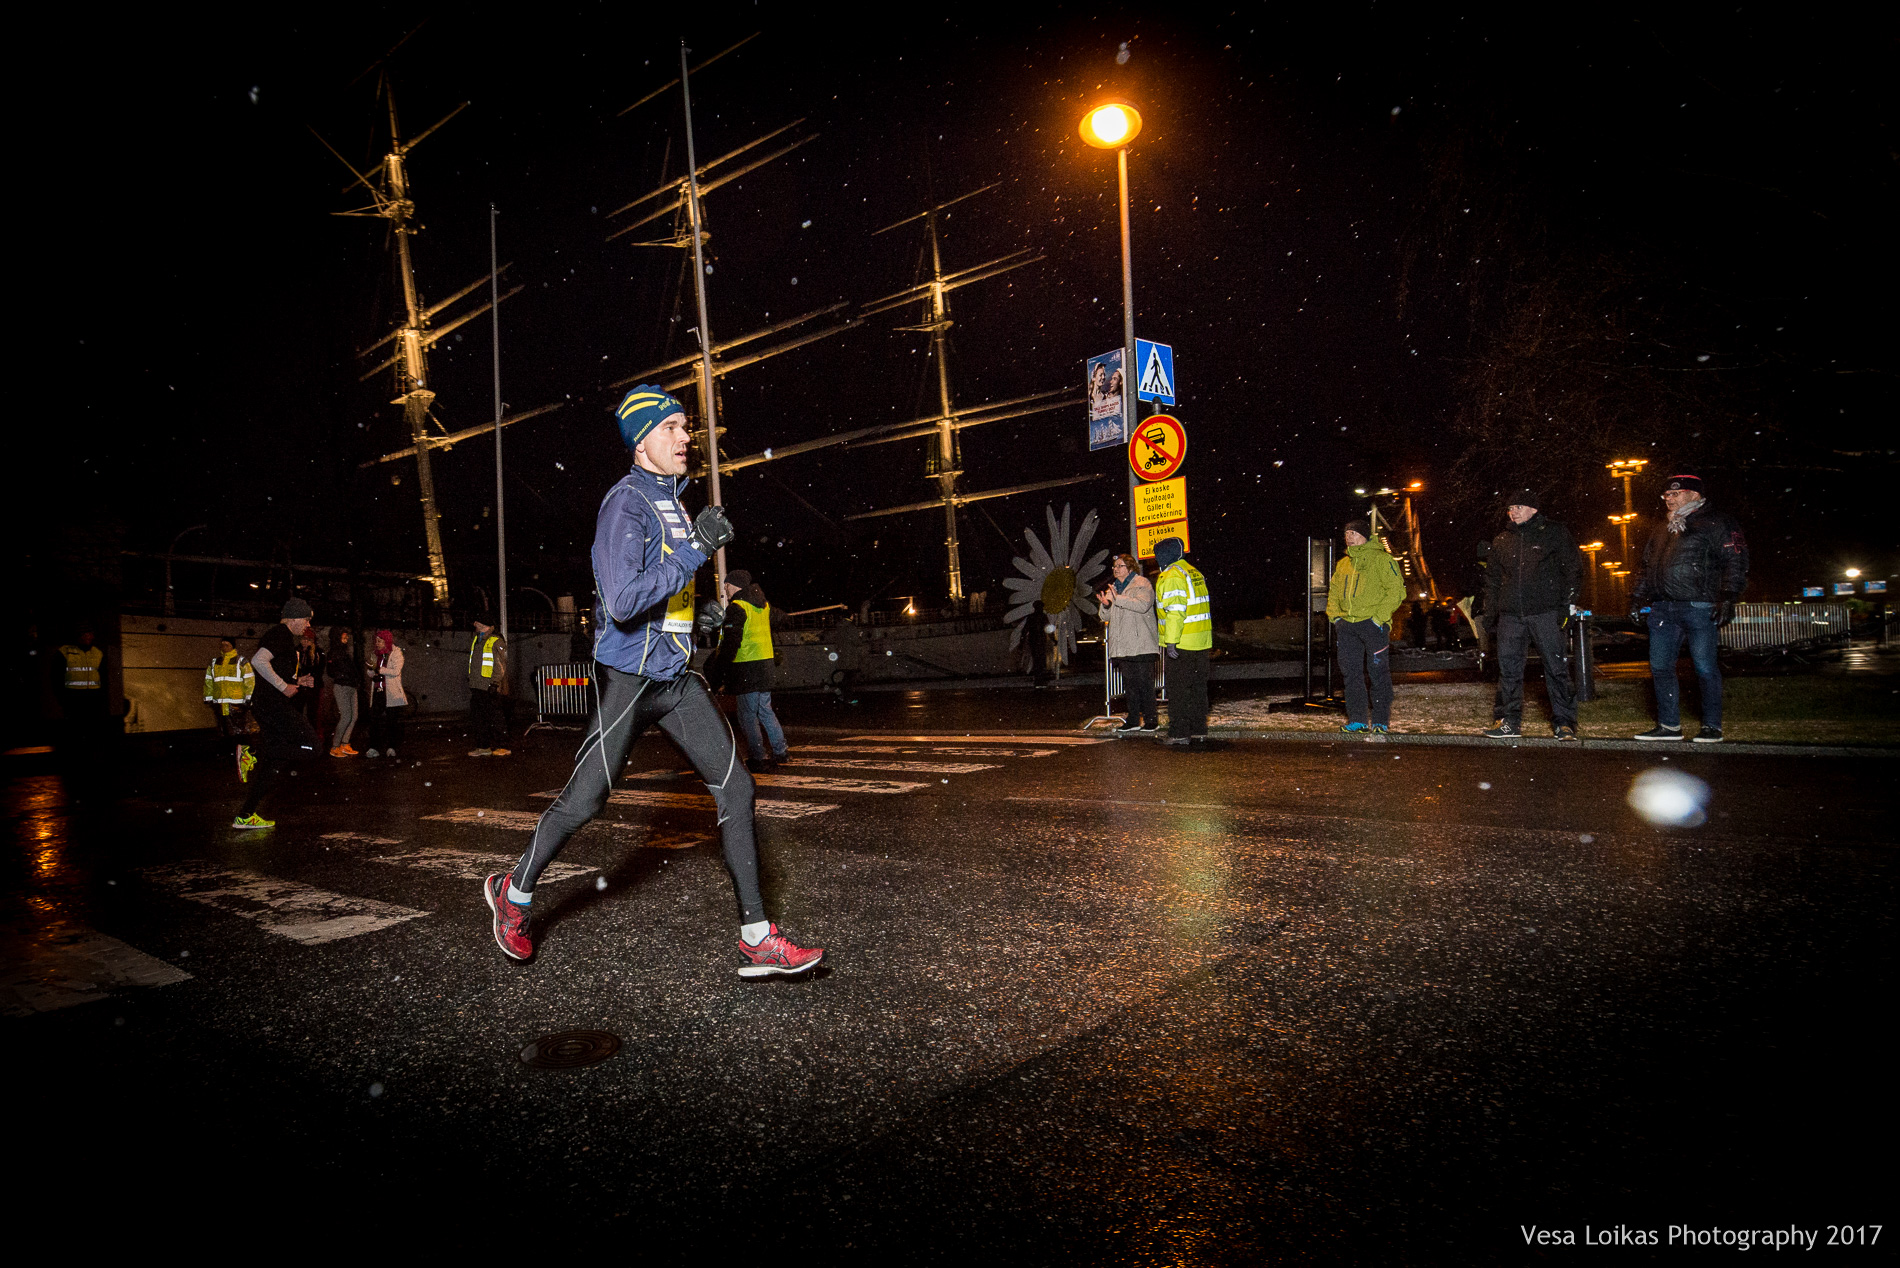 Sami Aalto 5 km kohdalla | Sami Aalto after 5k